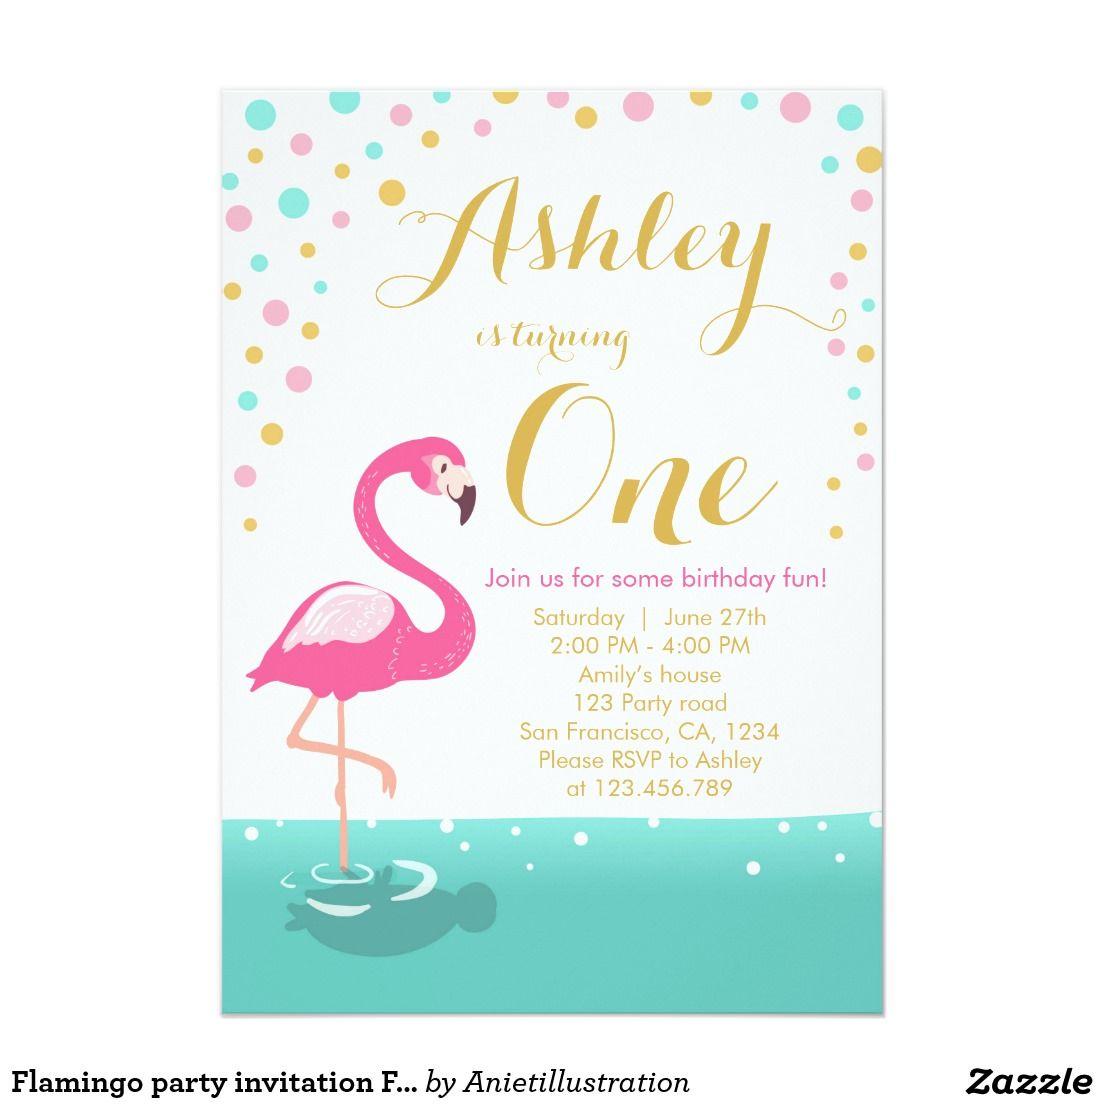 flamingo party invitation flamingo birthday invite in 2018